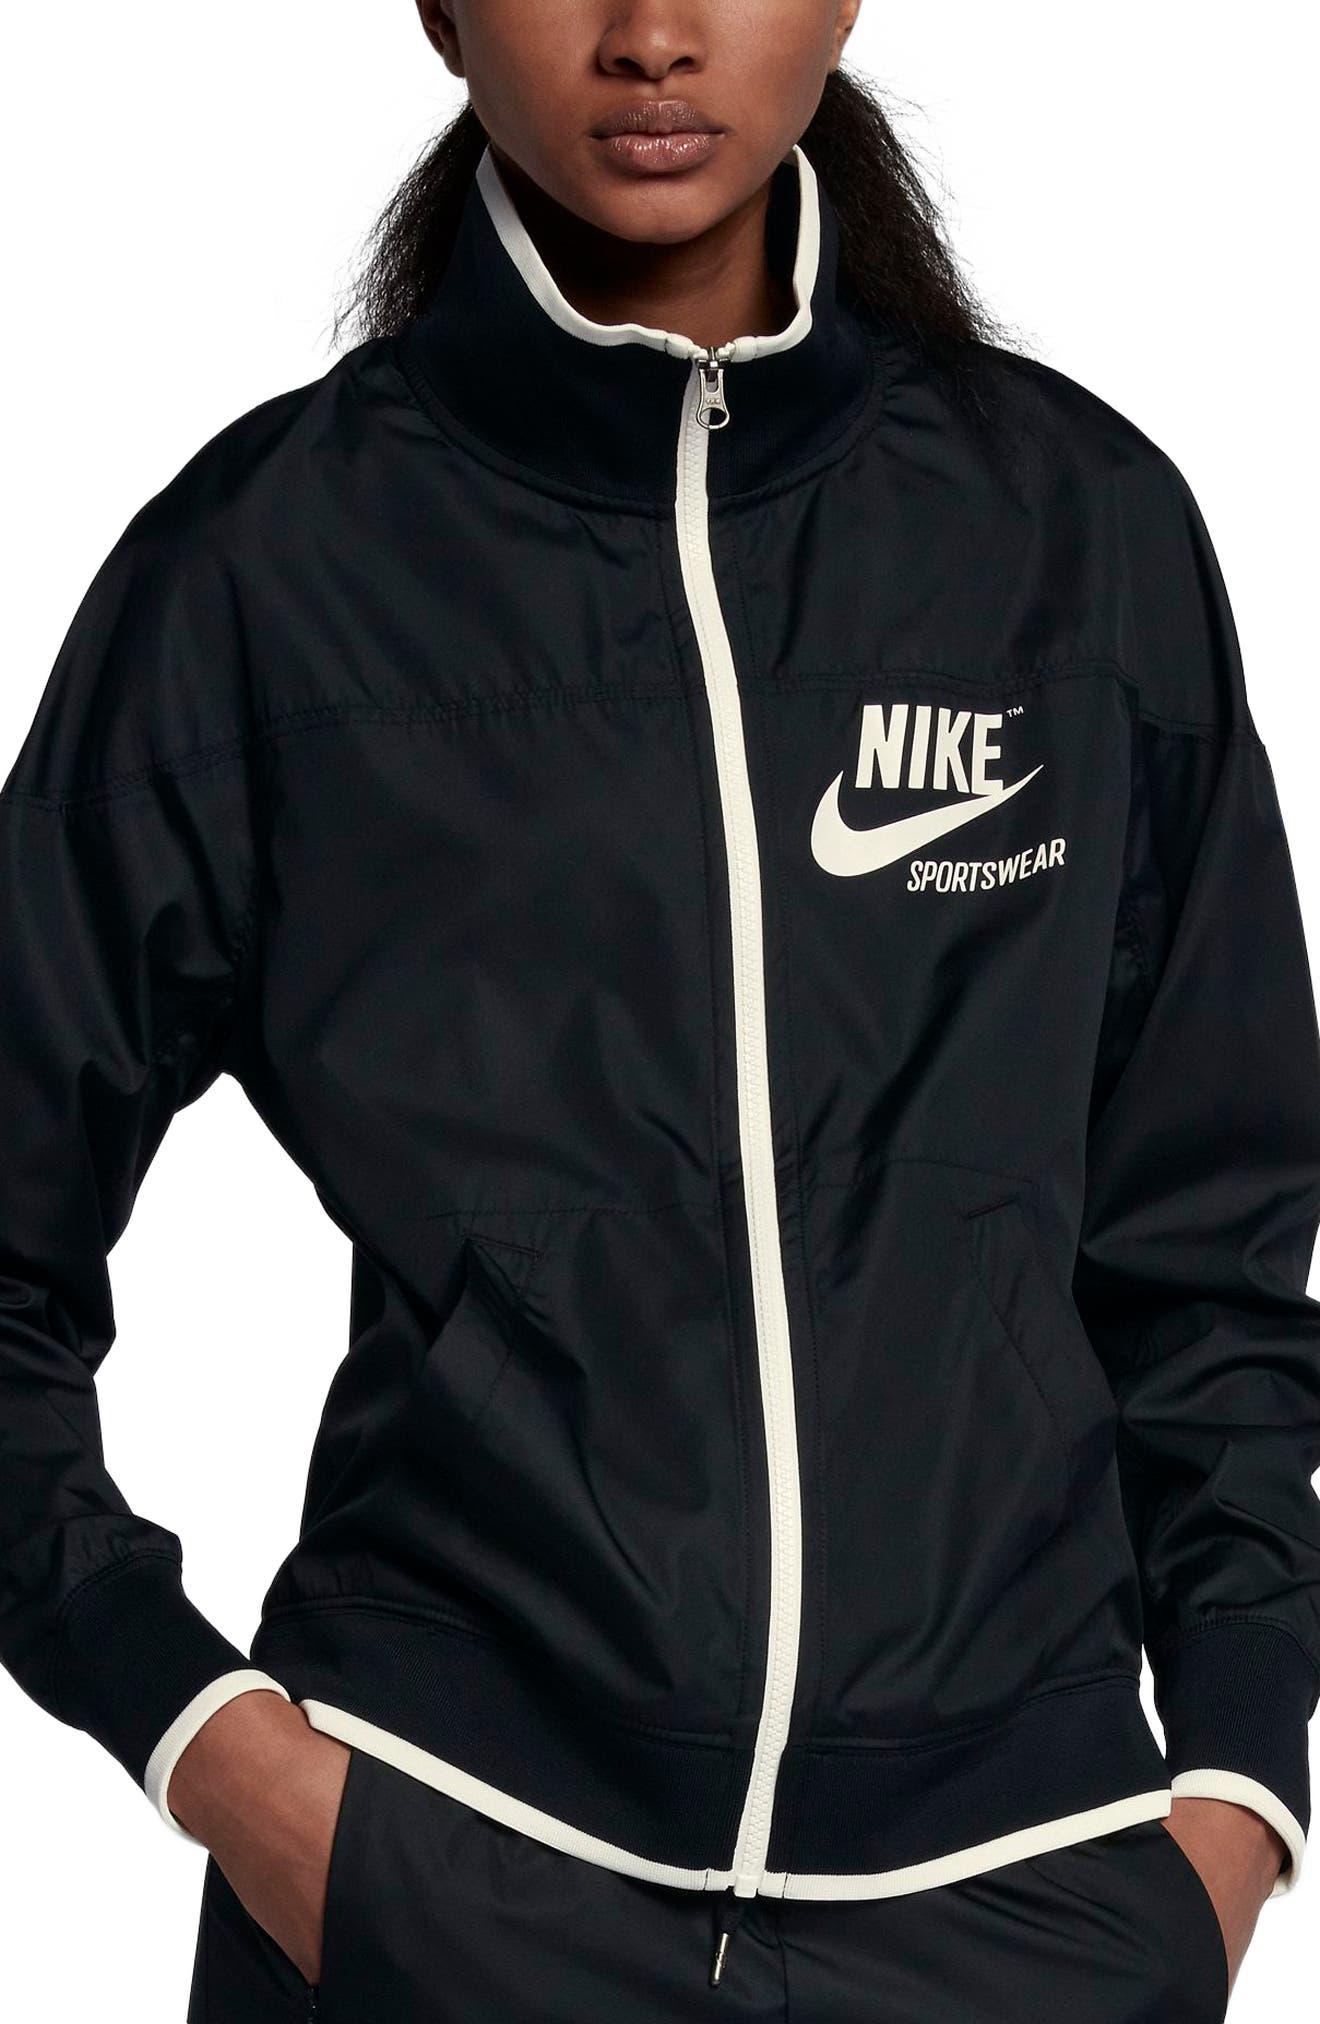 Sportswear Archive Jacket,                             Main thumbnail 1, color,                             Black/ Sail